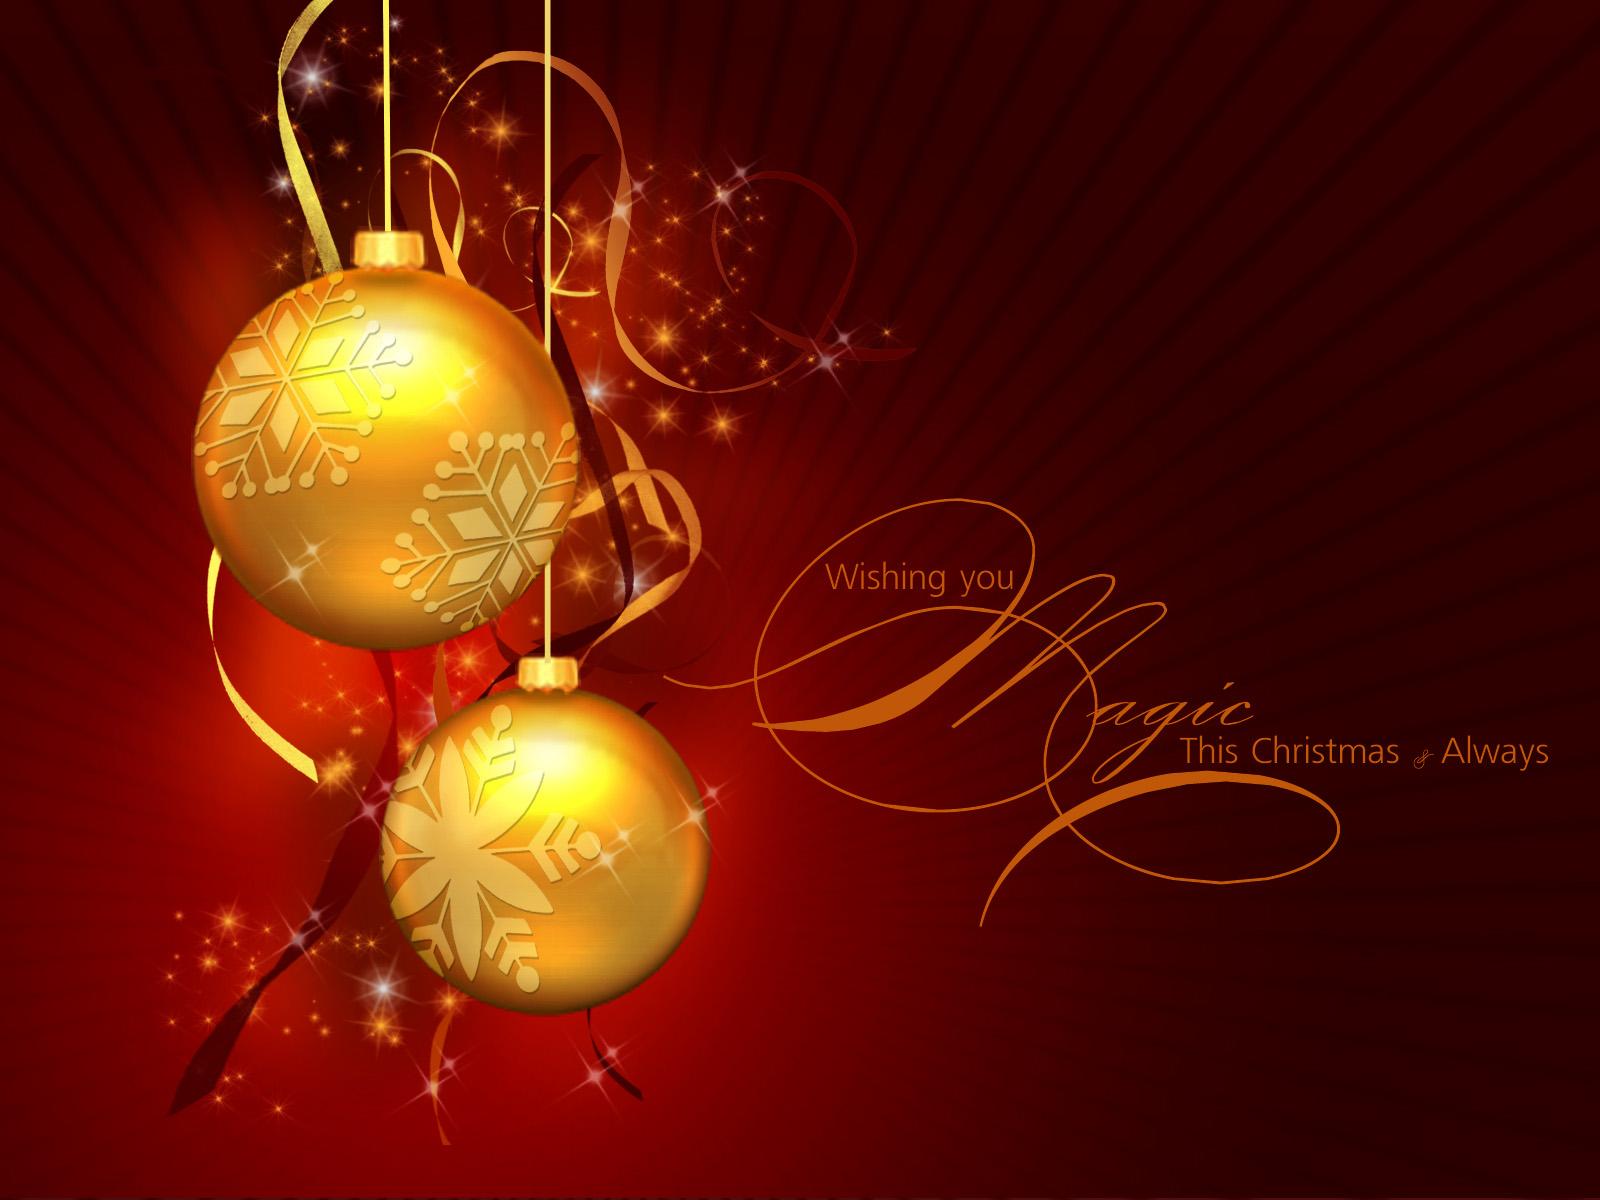 christmas wallpaper backgroundsfree christmas wallpaper downloads 1600x1200